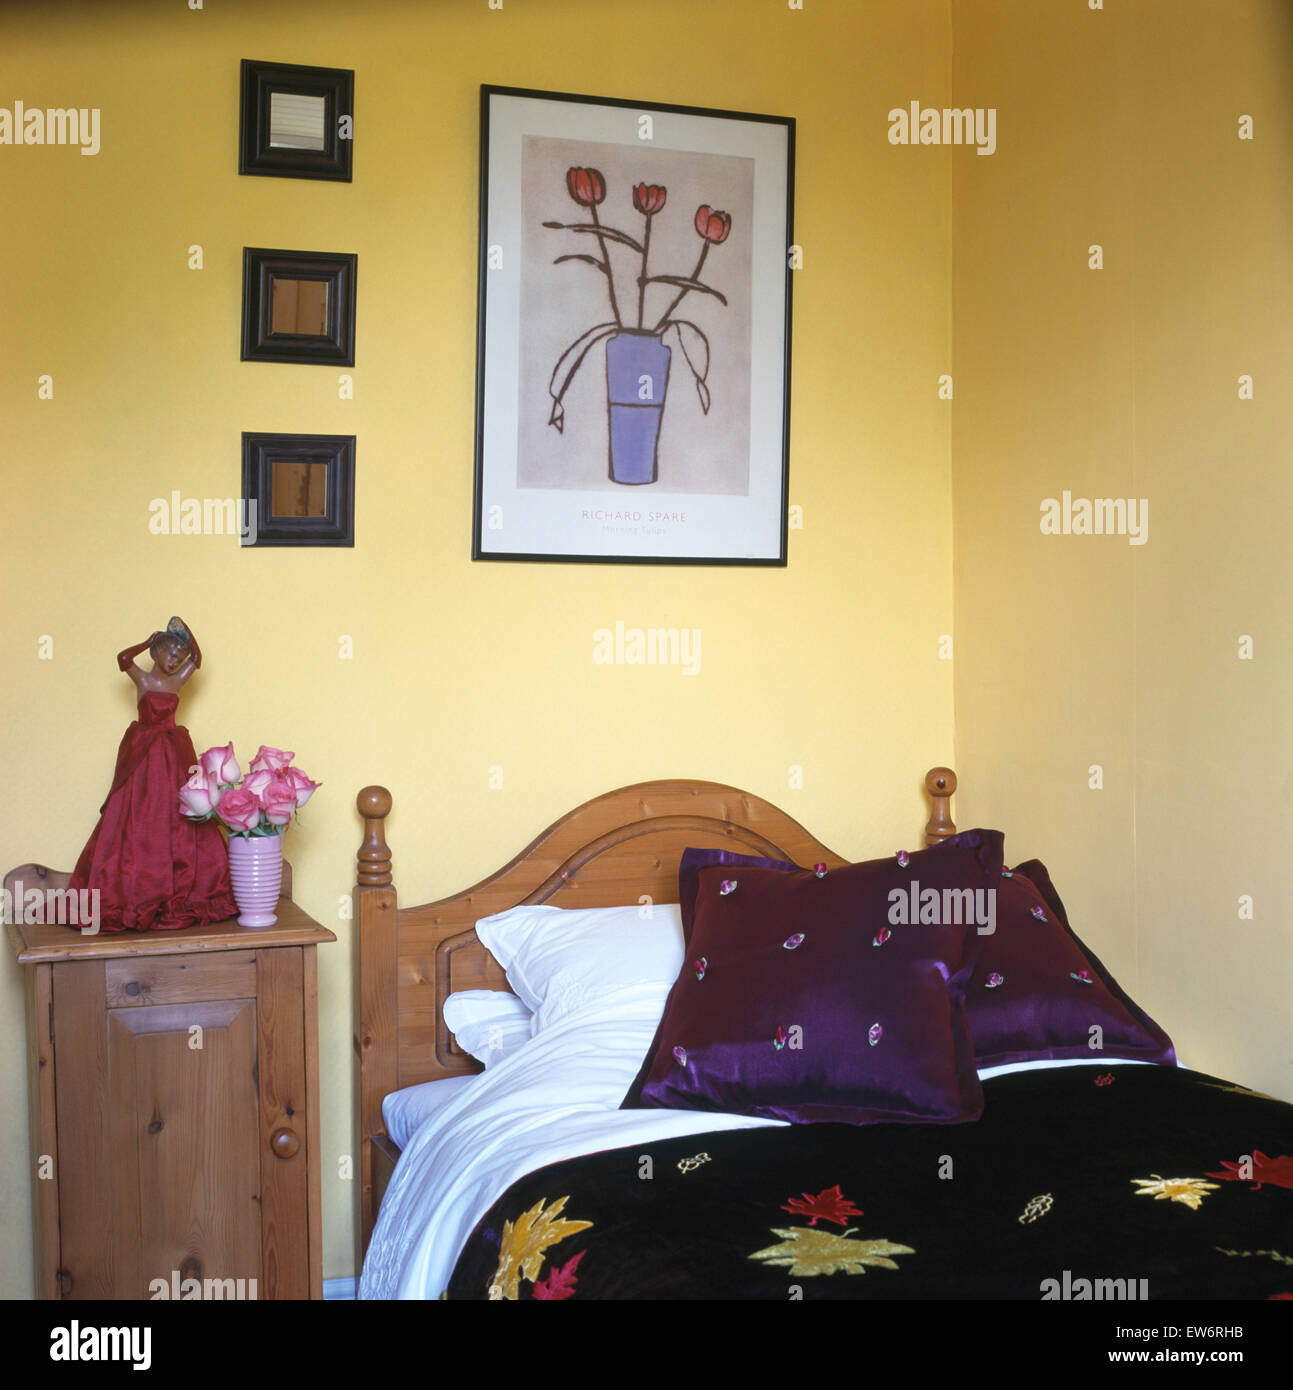 Pine Bedroom Furniture Stock Photos & Pine Bedroom Furniture Stock ...